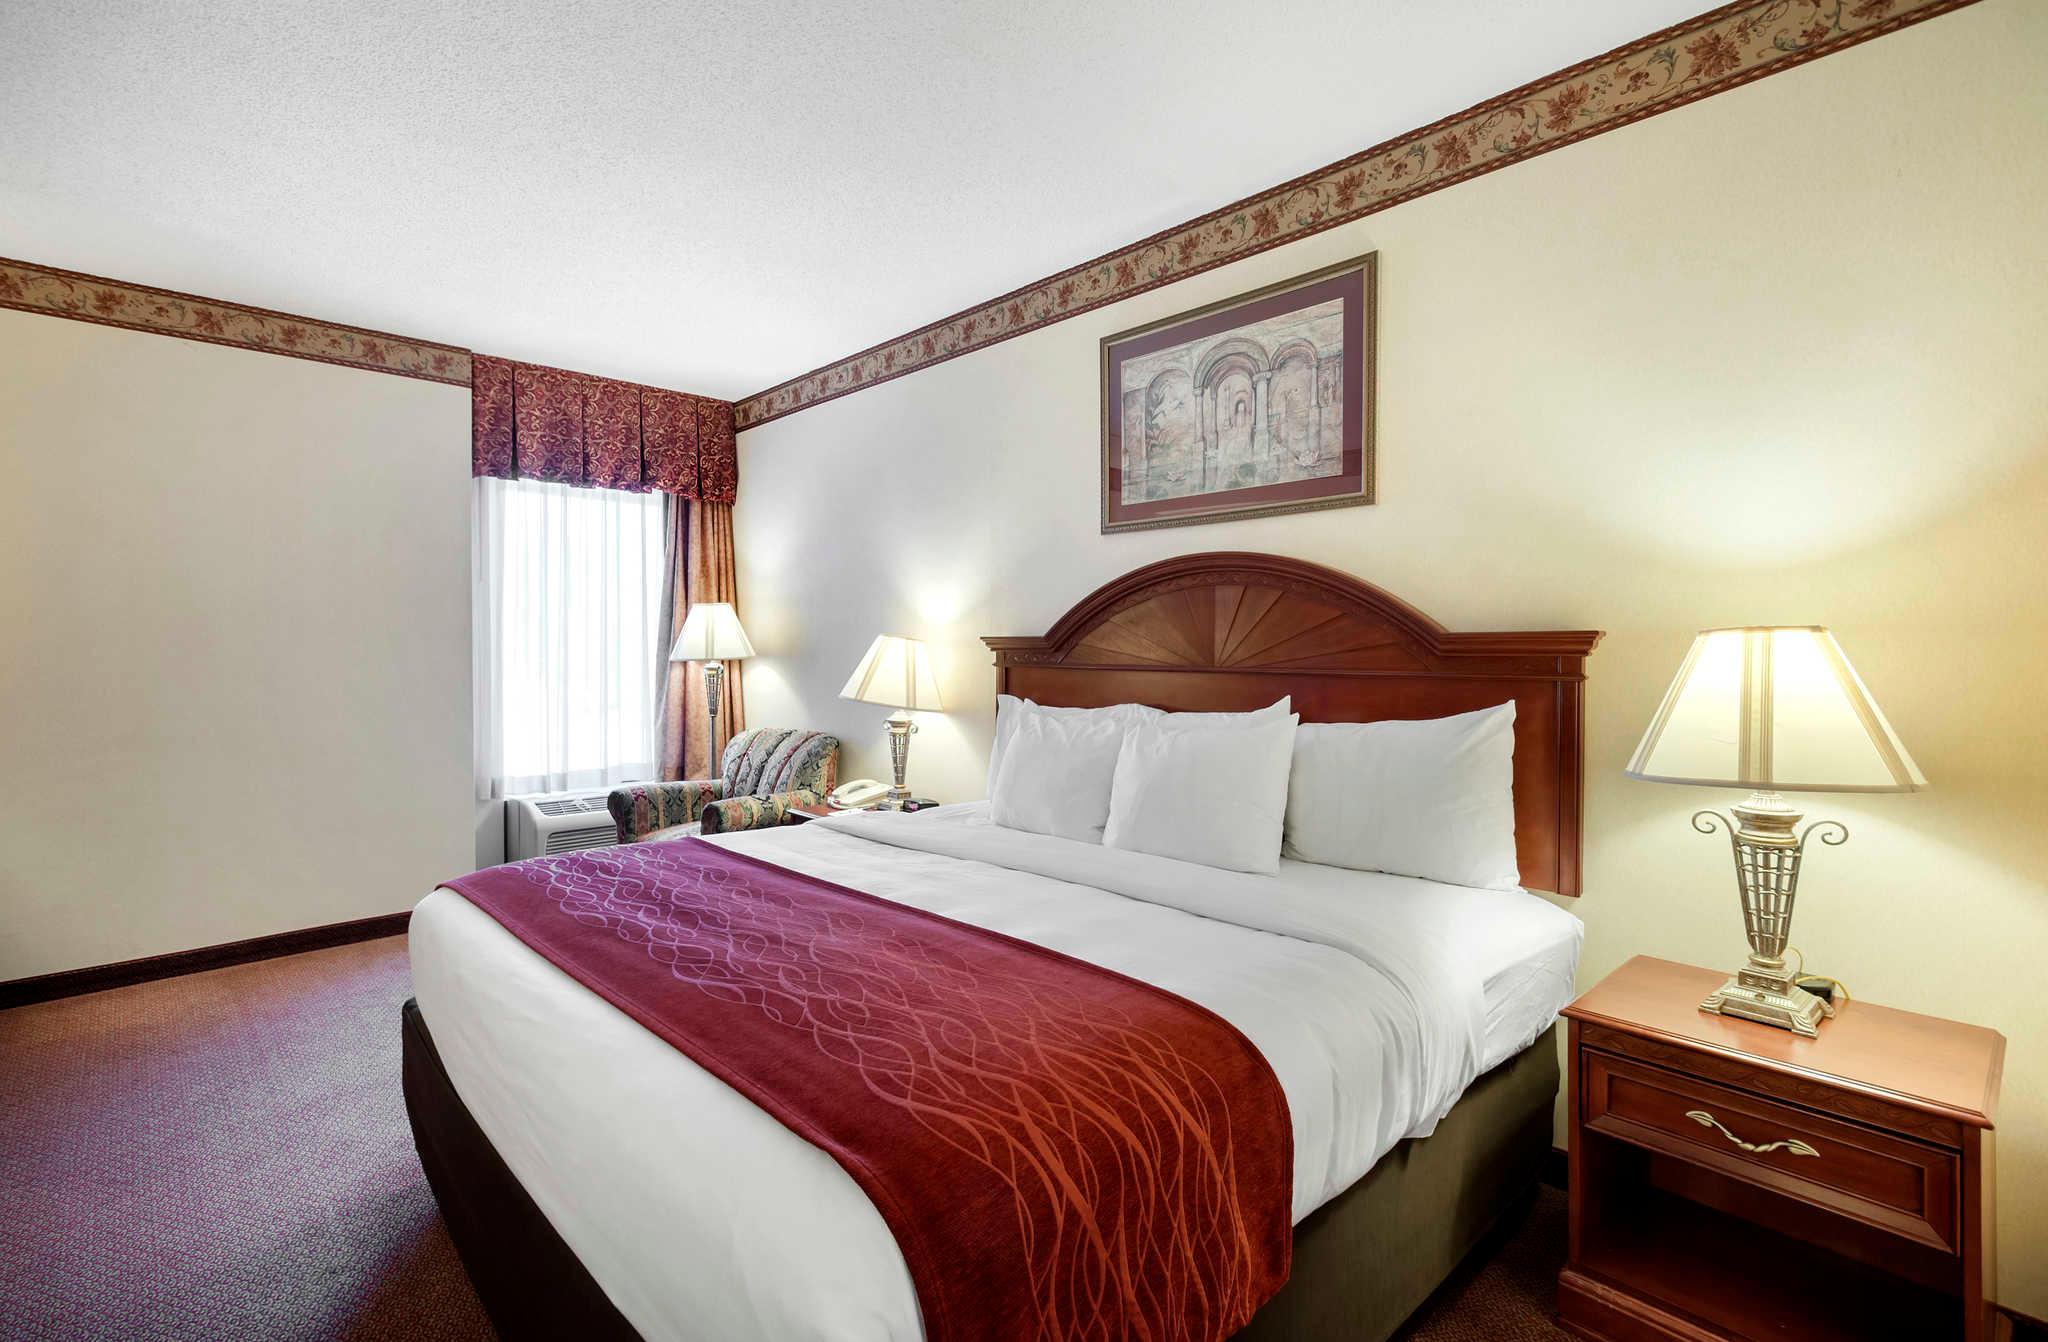 Comfort Inn & Suites Edgewood - Aberdeen image 9